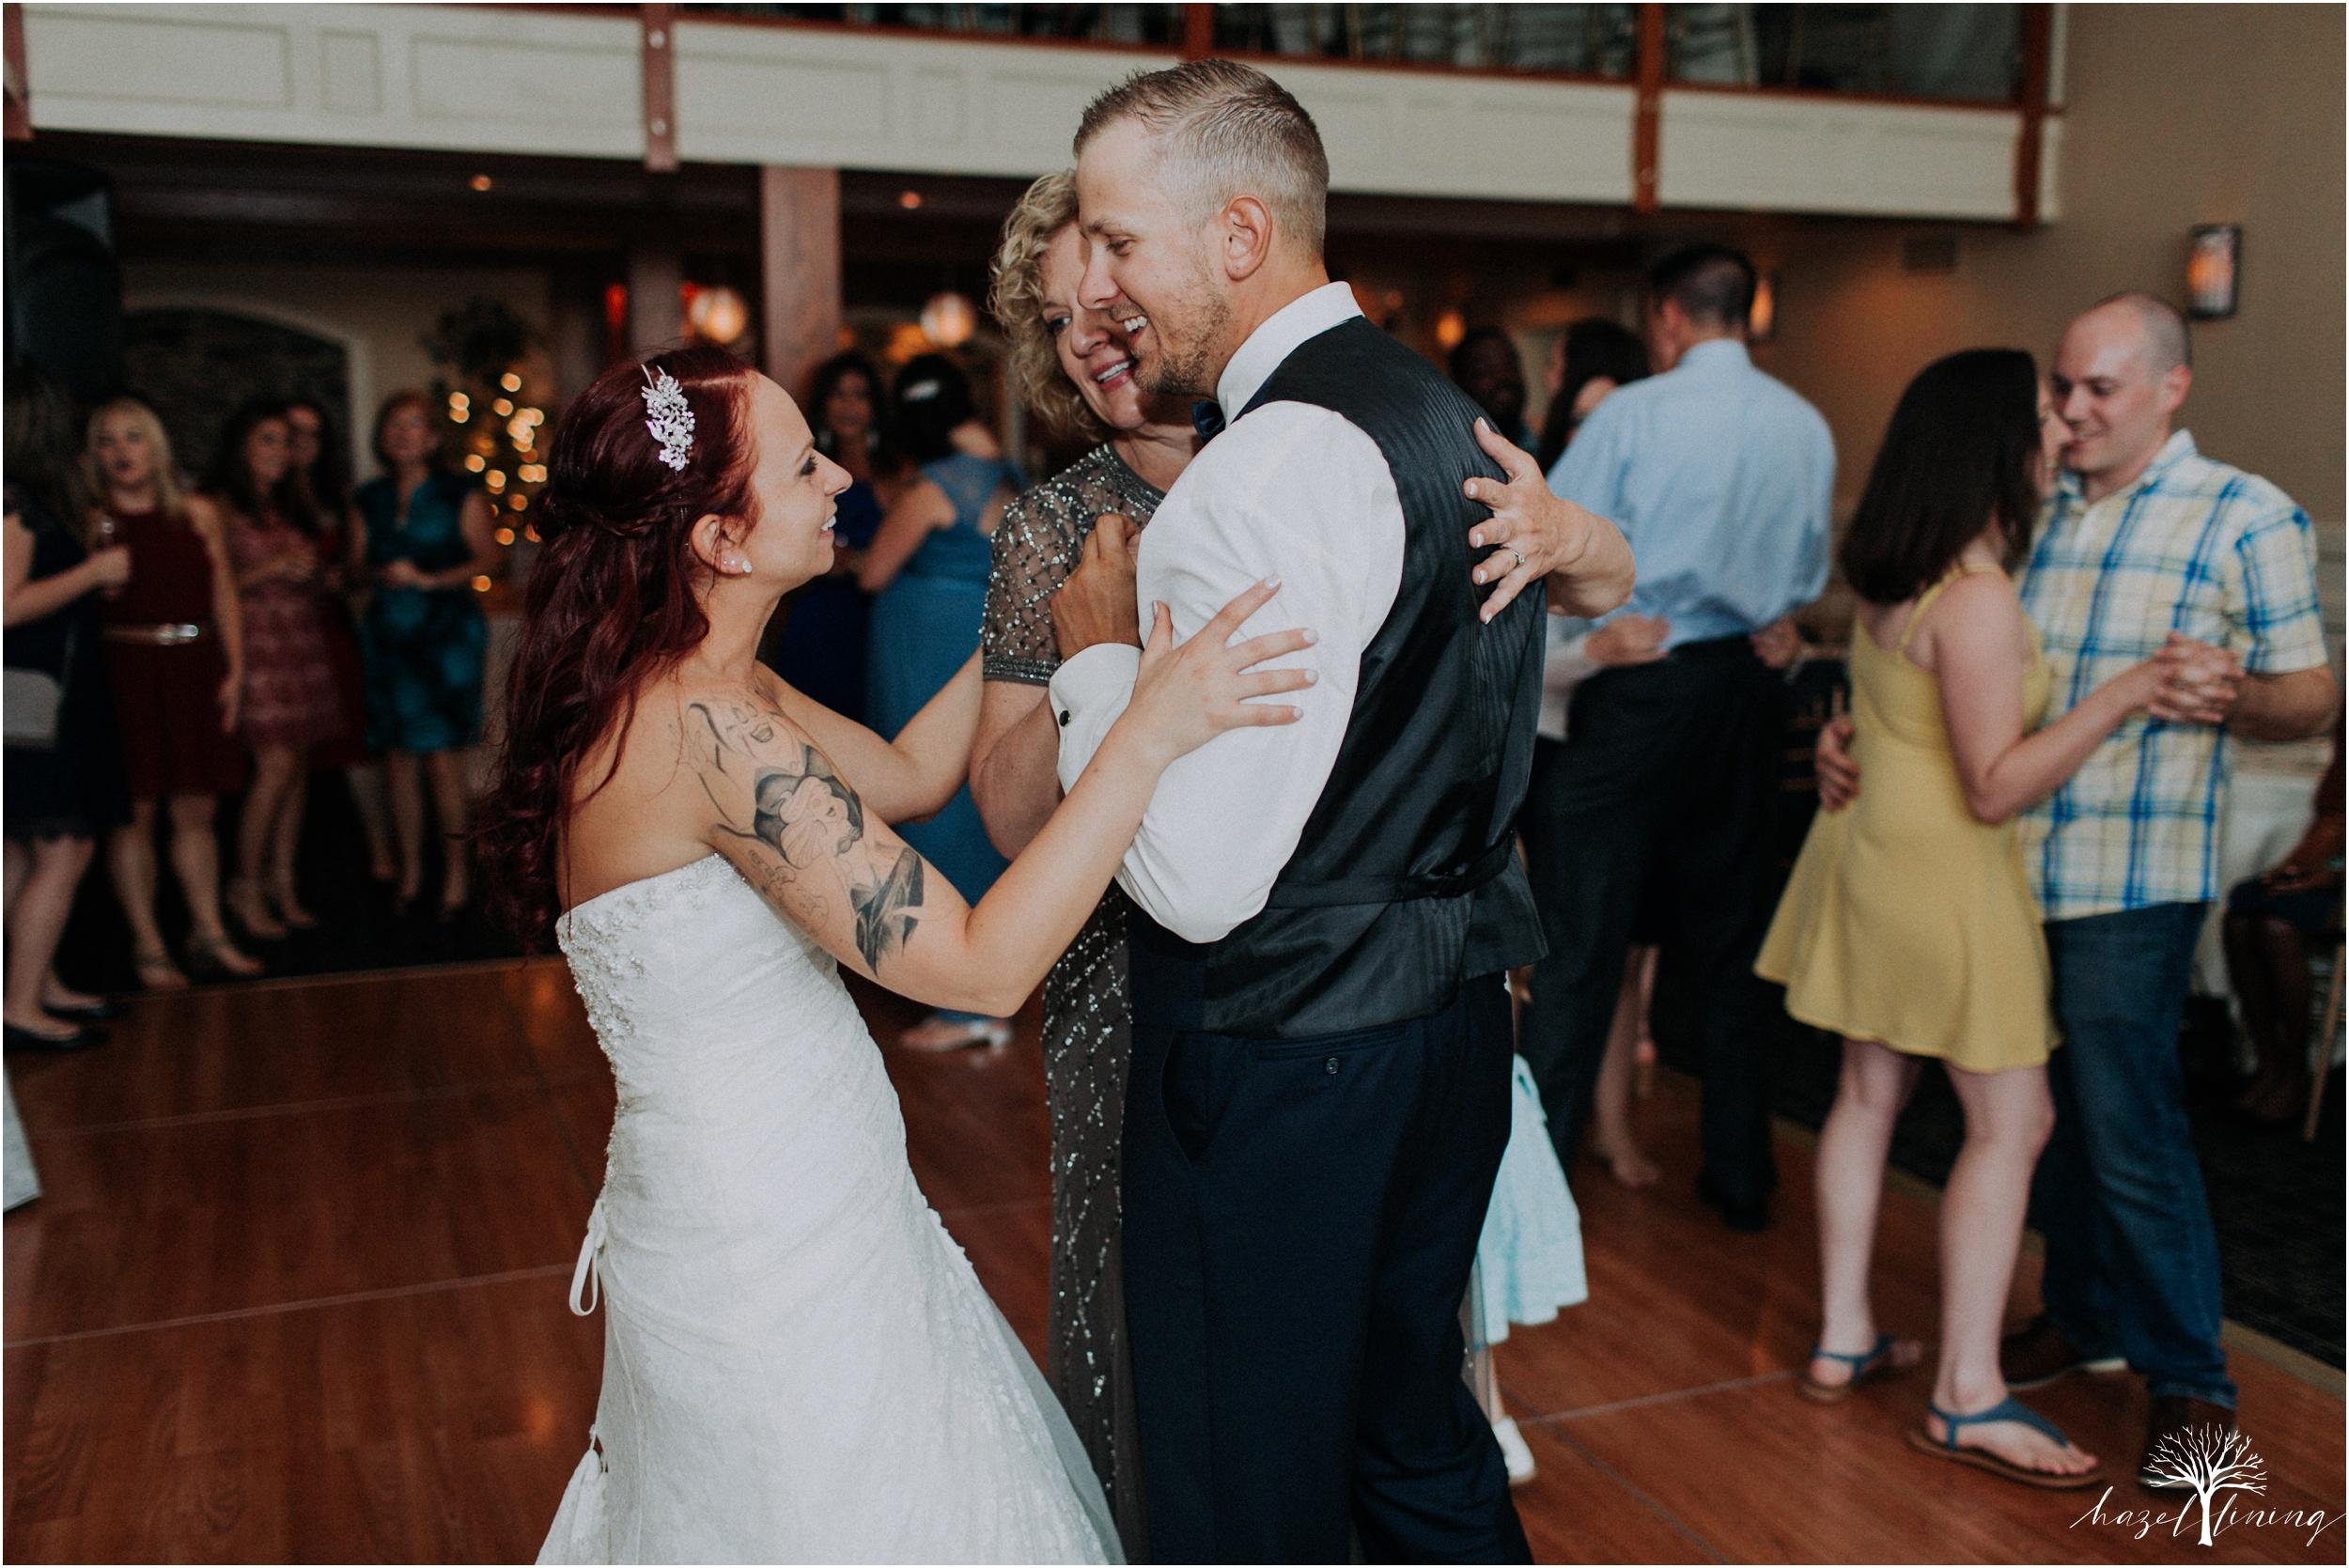 alyssa-james-stiteler-wedding-loft-and-sweet-water-cc-pennsburg-pennsylvania-hazel-lining-travel-wedding-elopement-photography_0136.jpg